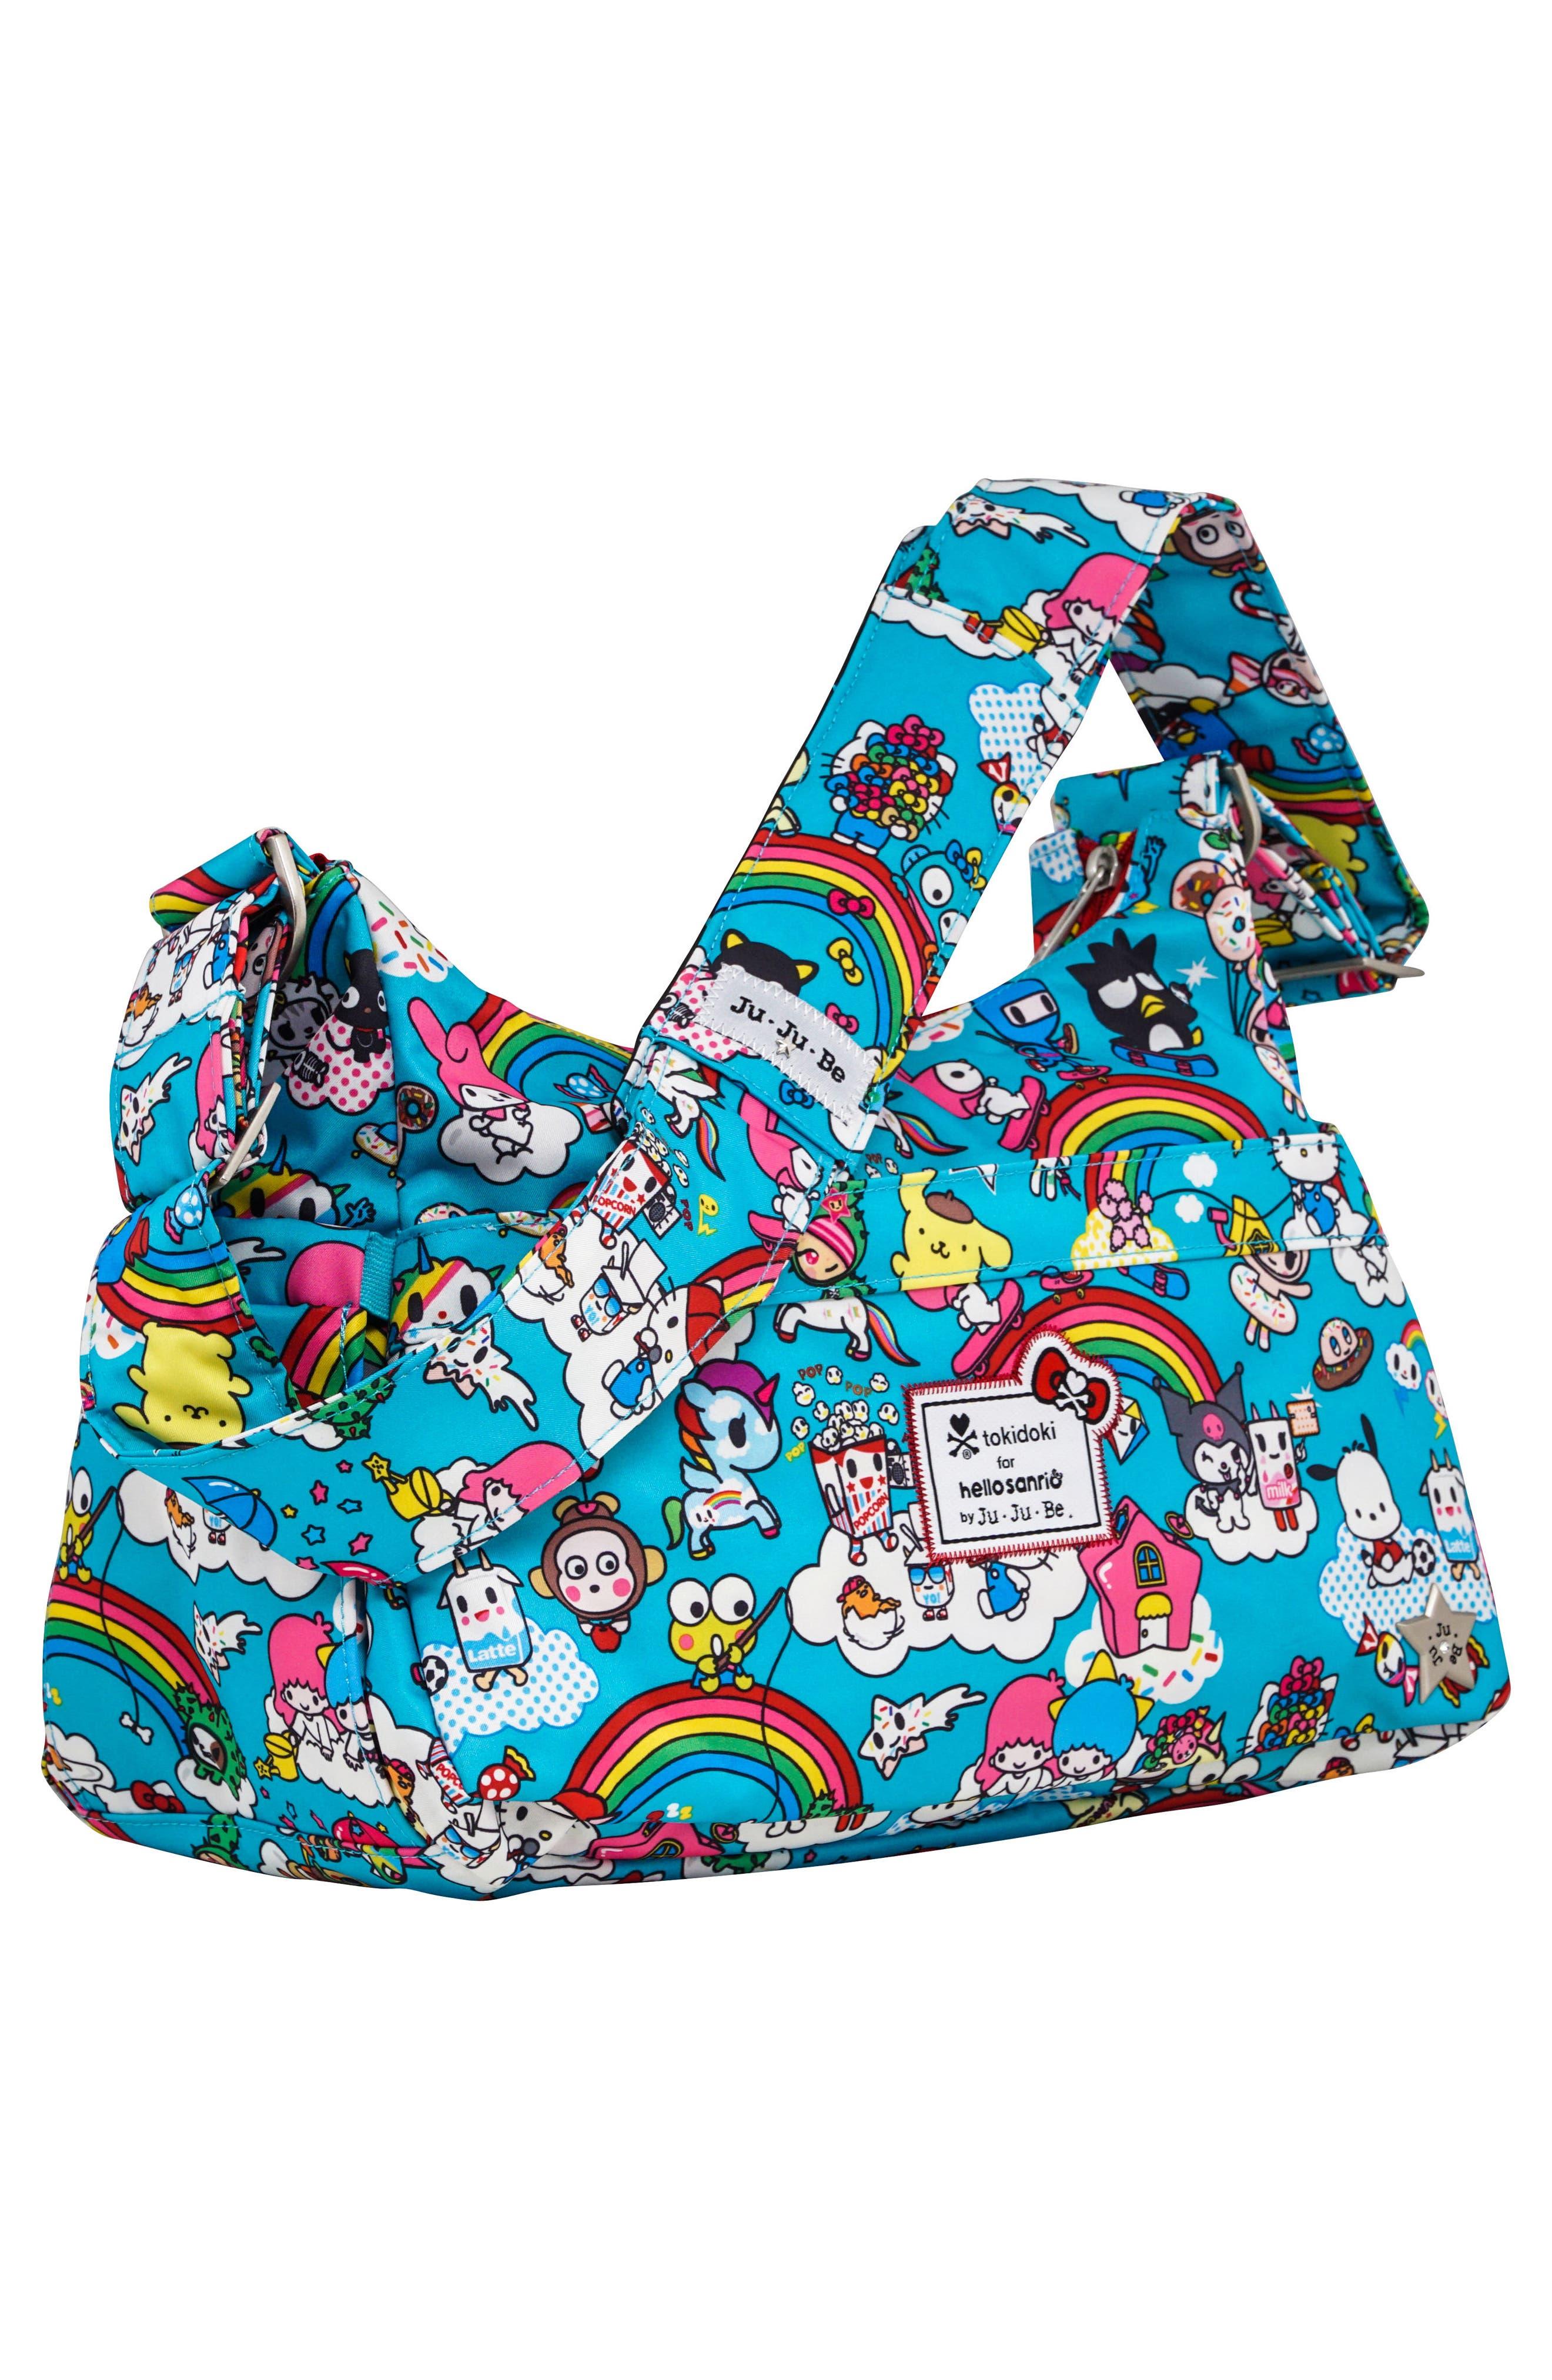 x tokidoki for Hello Sanrio Rainbow Dreams Be Hobo Diaper Bag,                             Alternate thumbnail 2, color,                             433